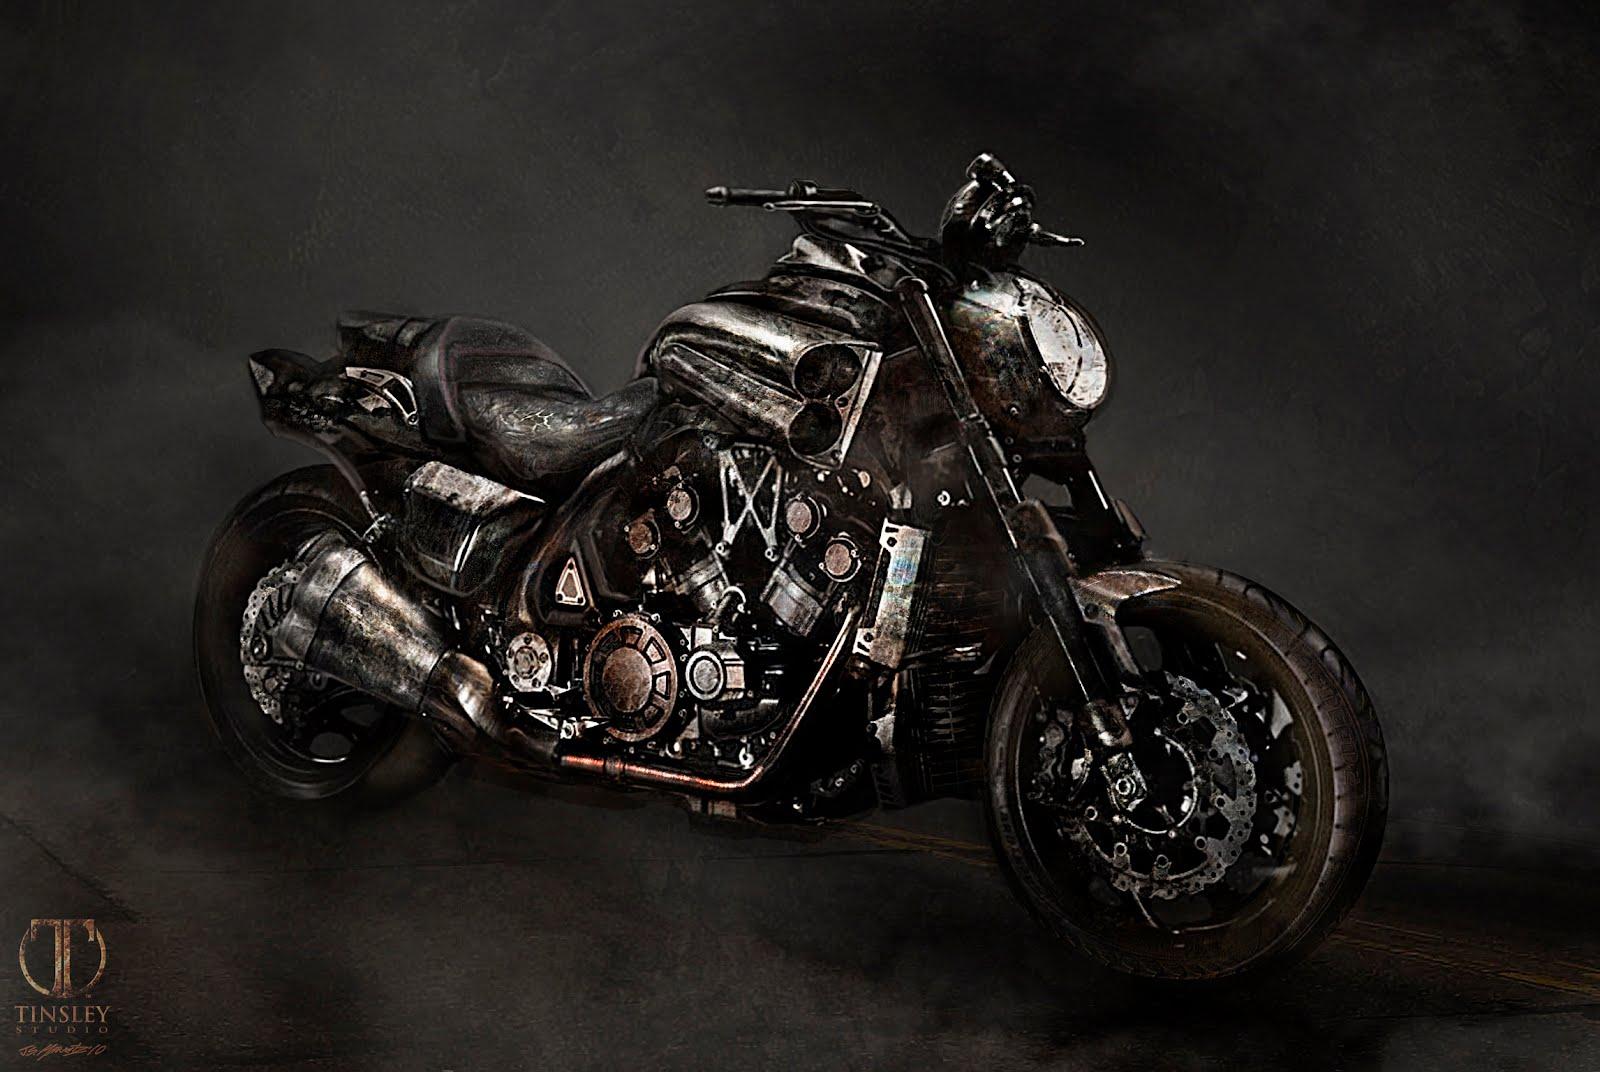 Photo Collection Ghostrider 2 On Bike